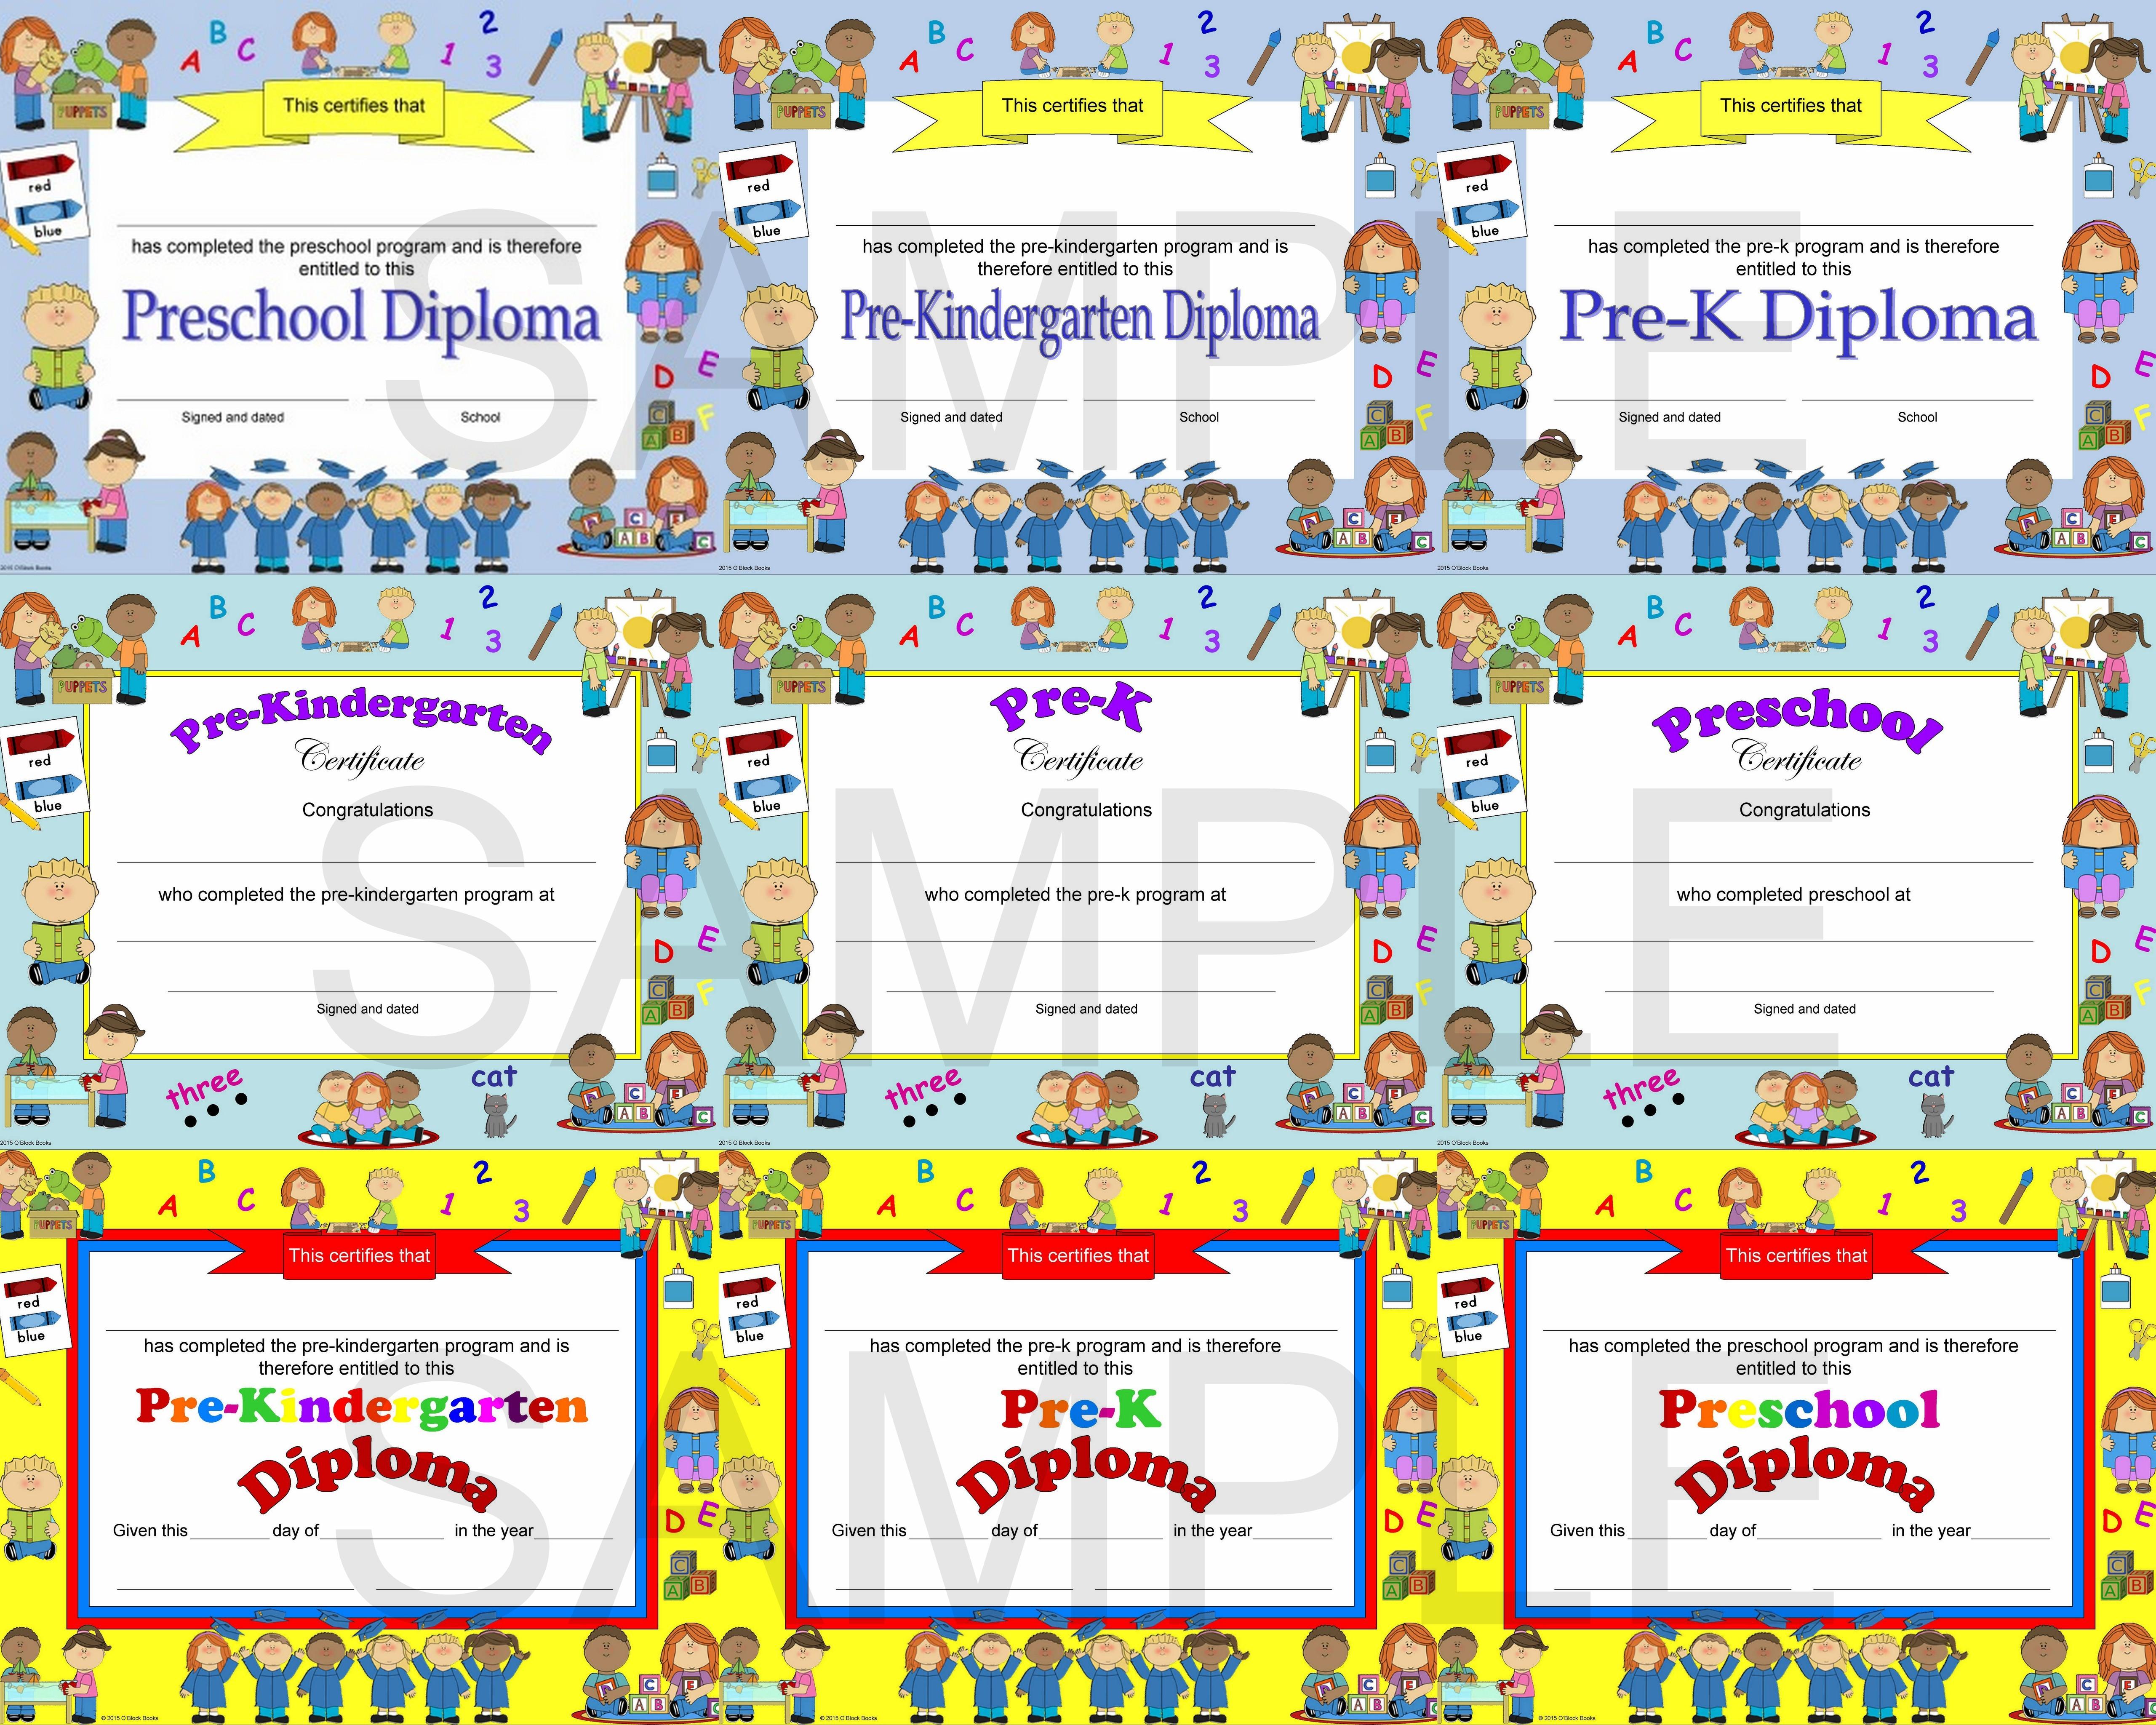 Preschool, Pre-K, Pre-Kindergarten Diplomas, Certificates ...